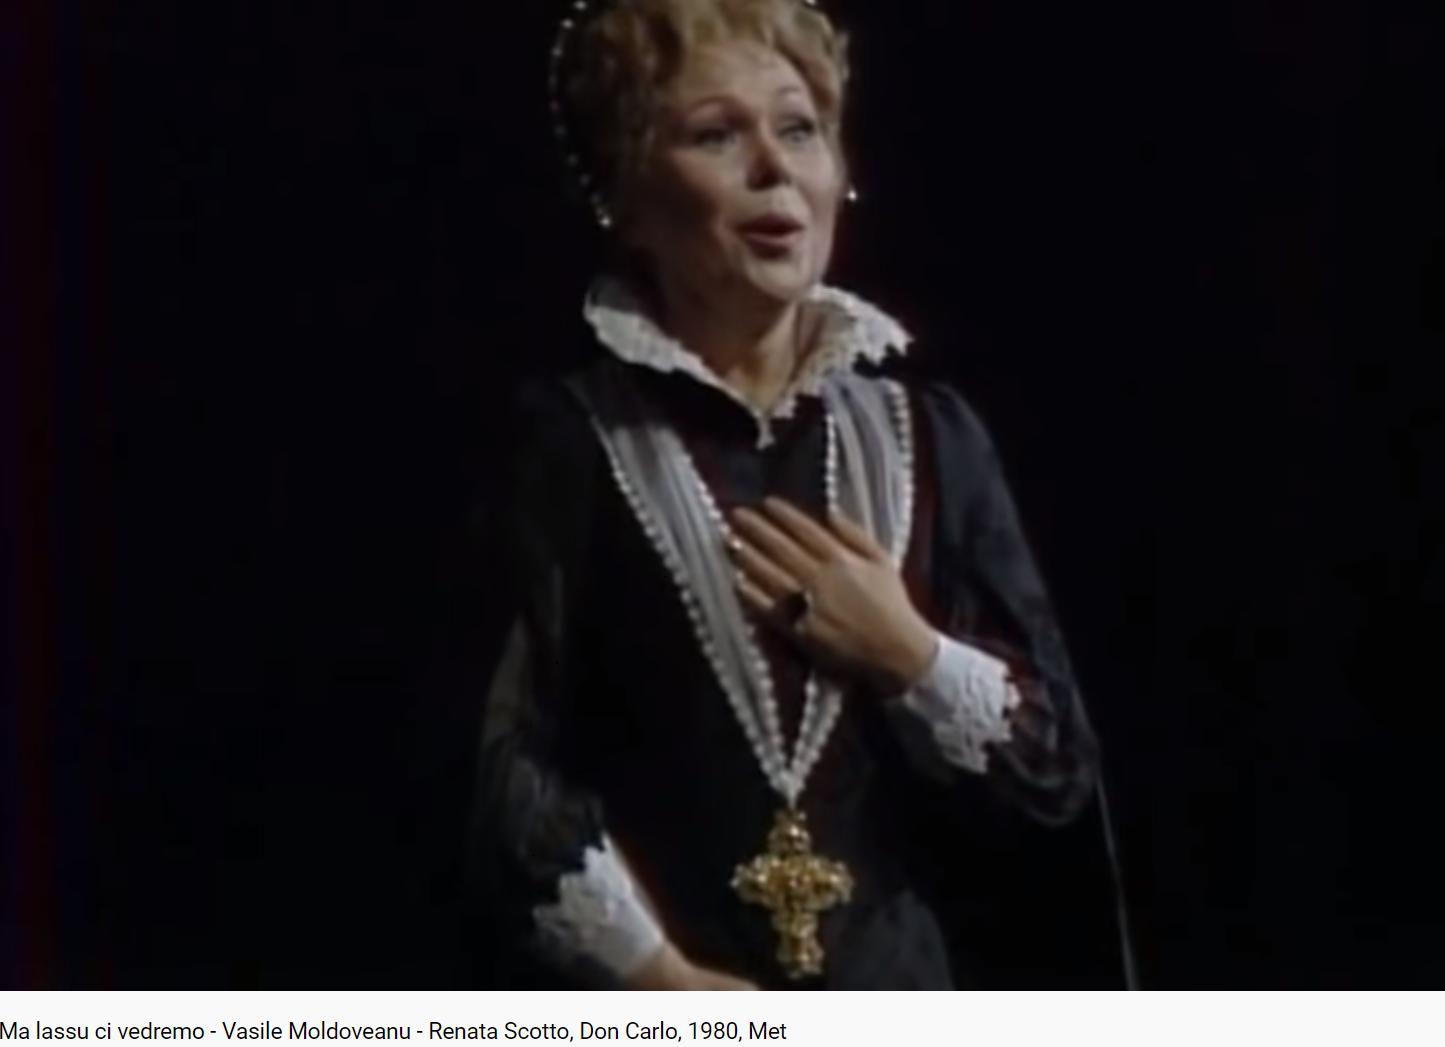 Verdi Don Carlo Ma lassu ci vedremo (MET 1980)